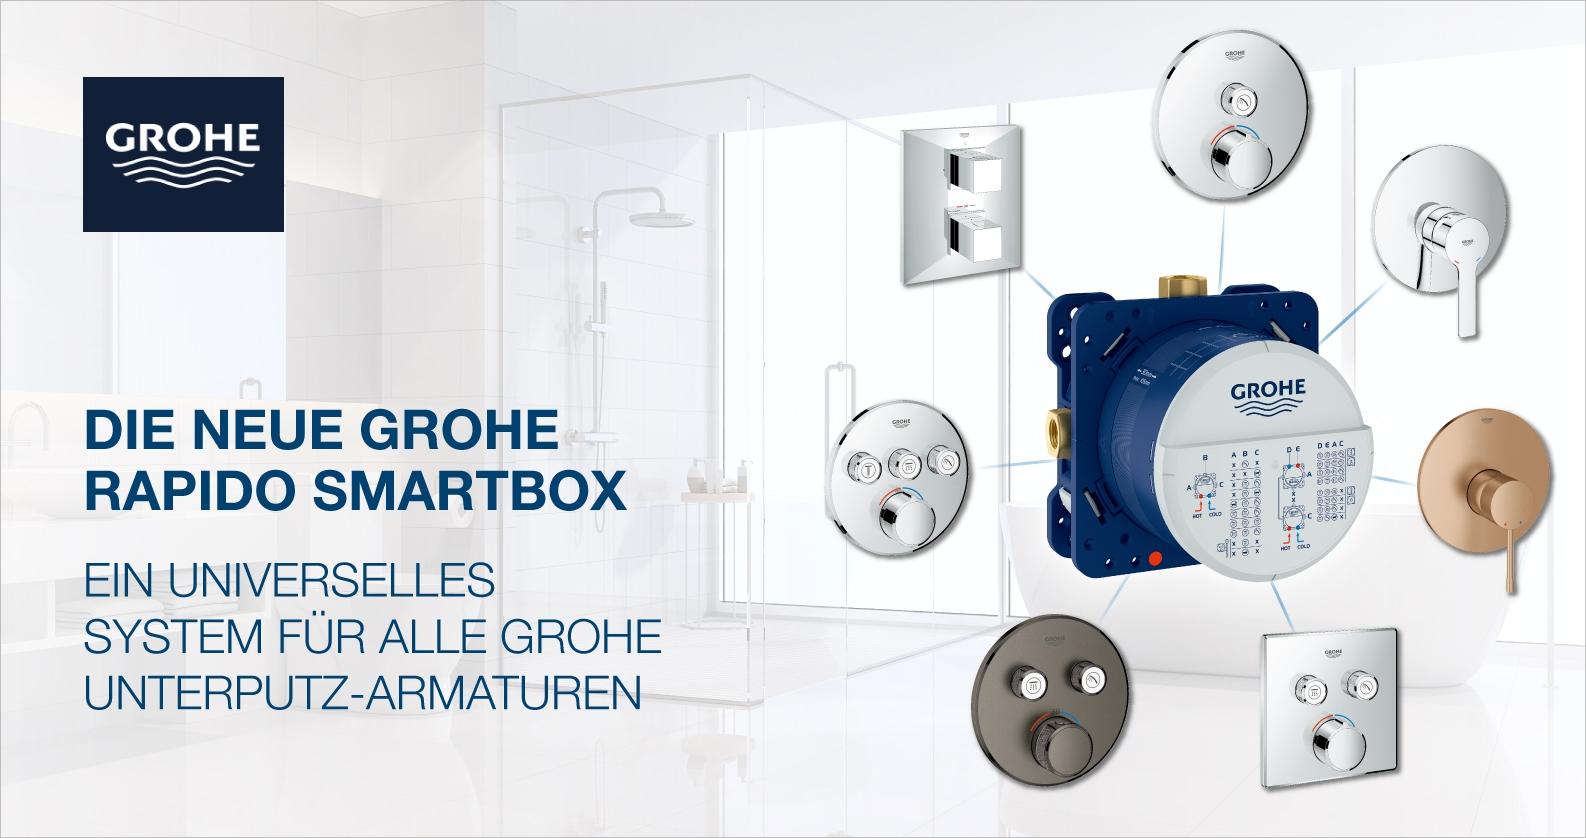 GROHE Rapido SmartBox